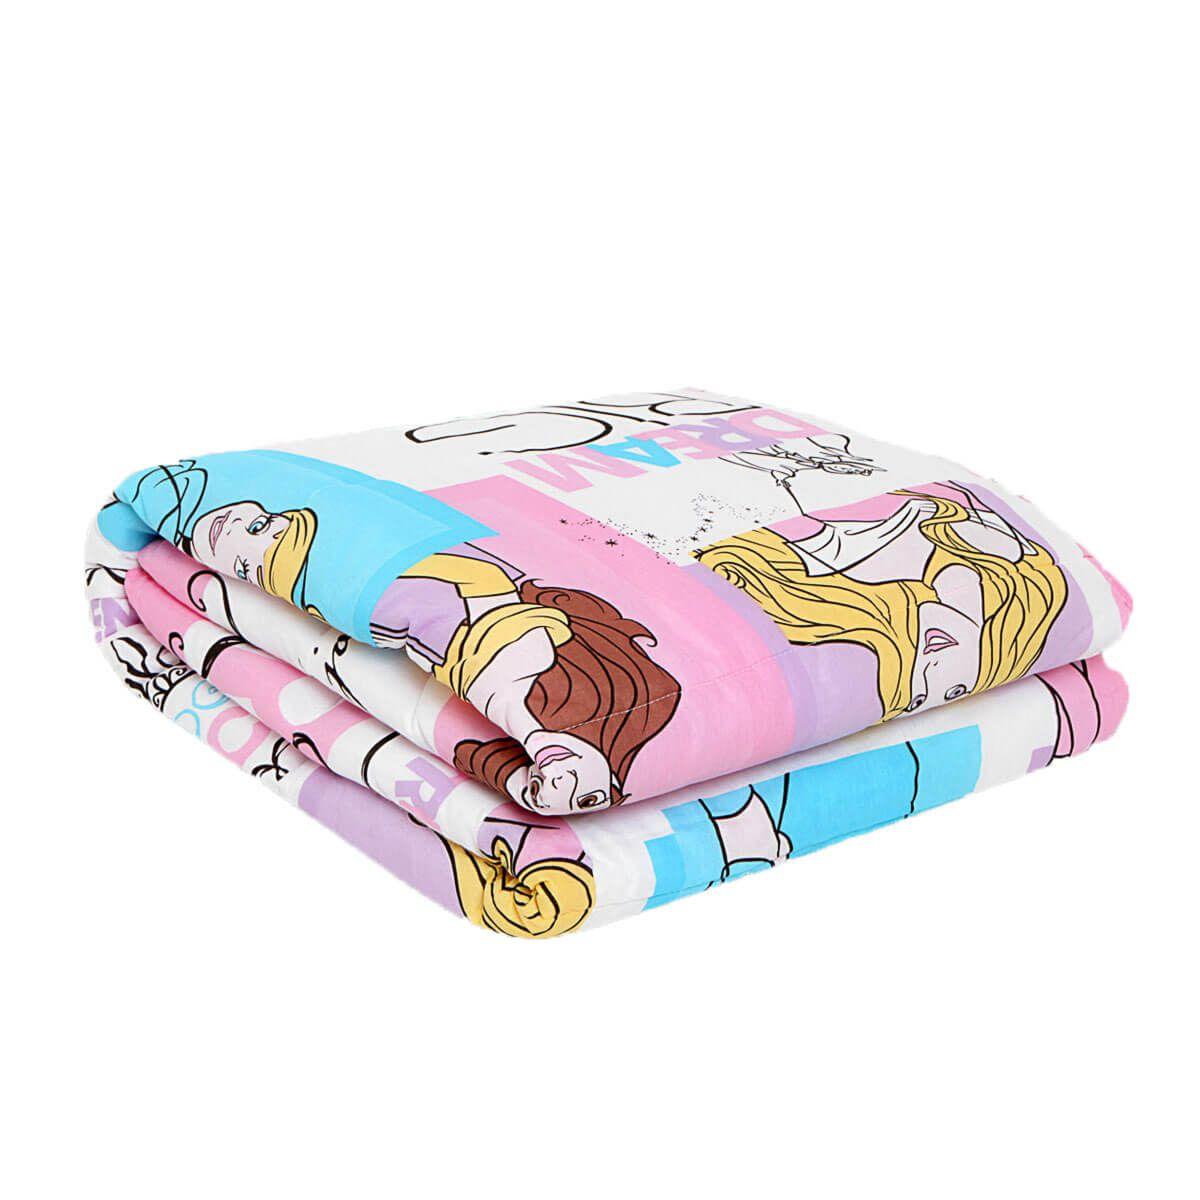 Kit Infantil Princesas Power Disney Edredom + Jogo De Cama Santista